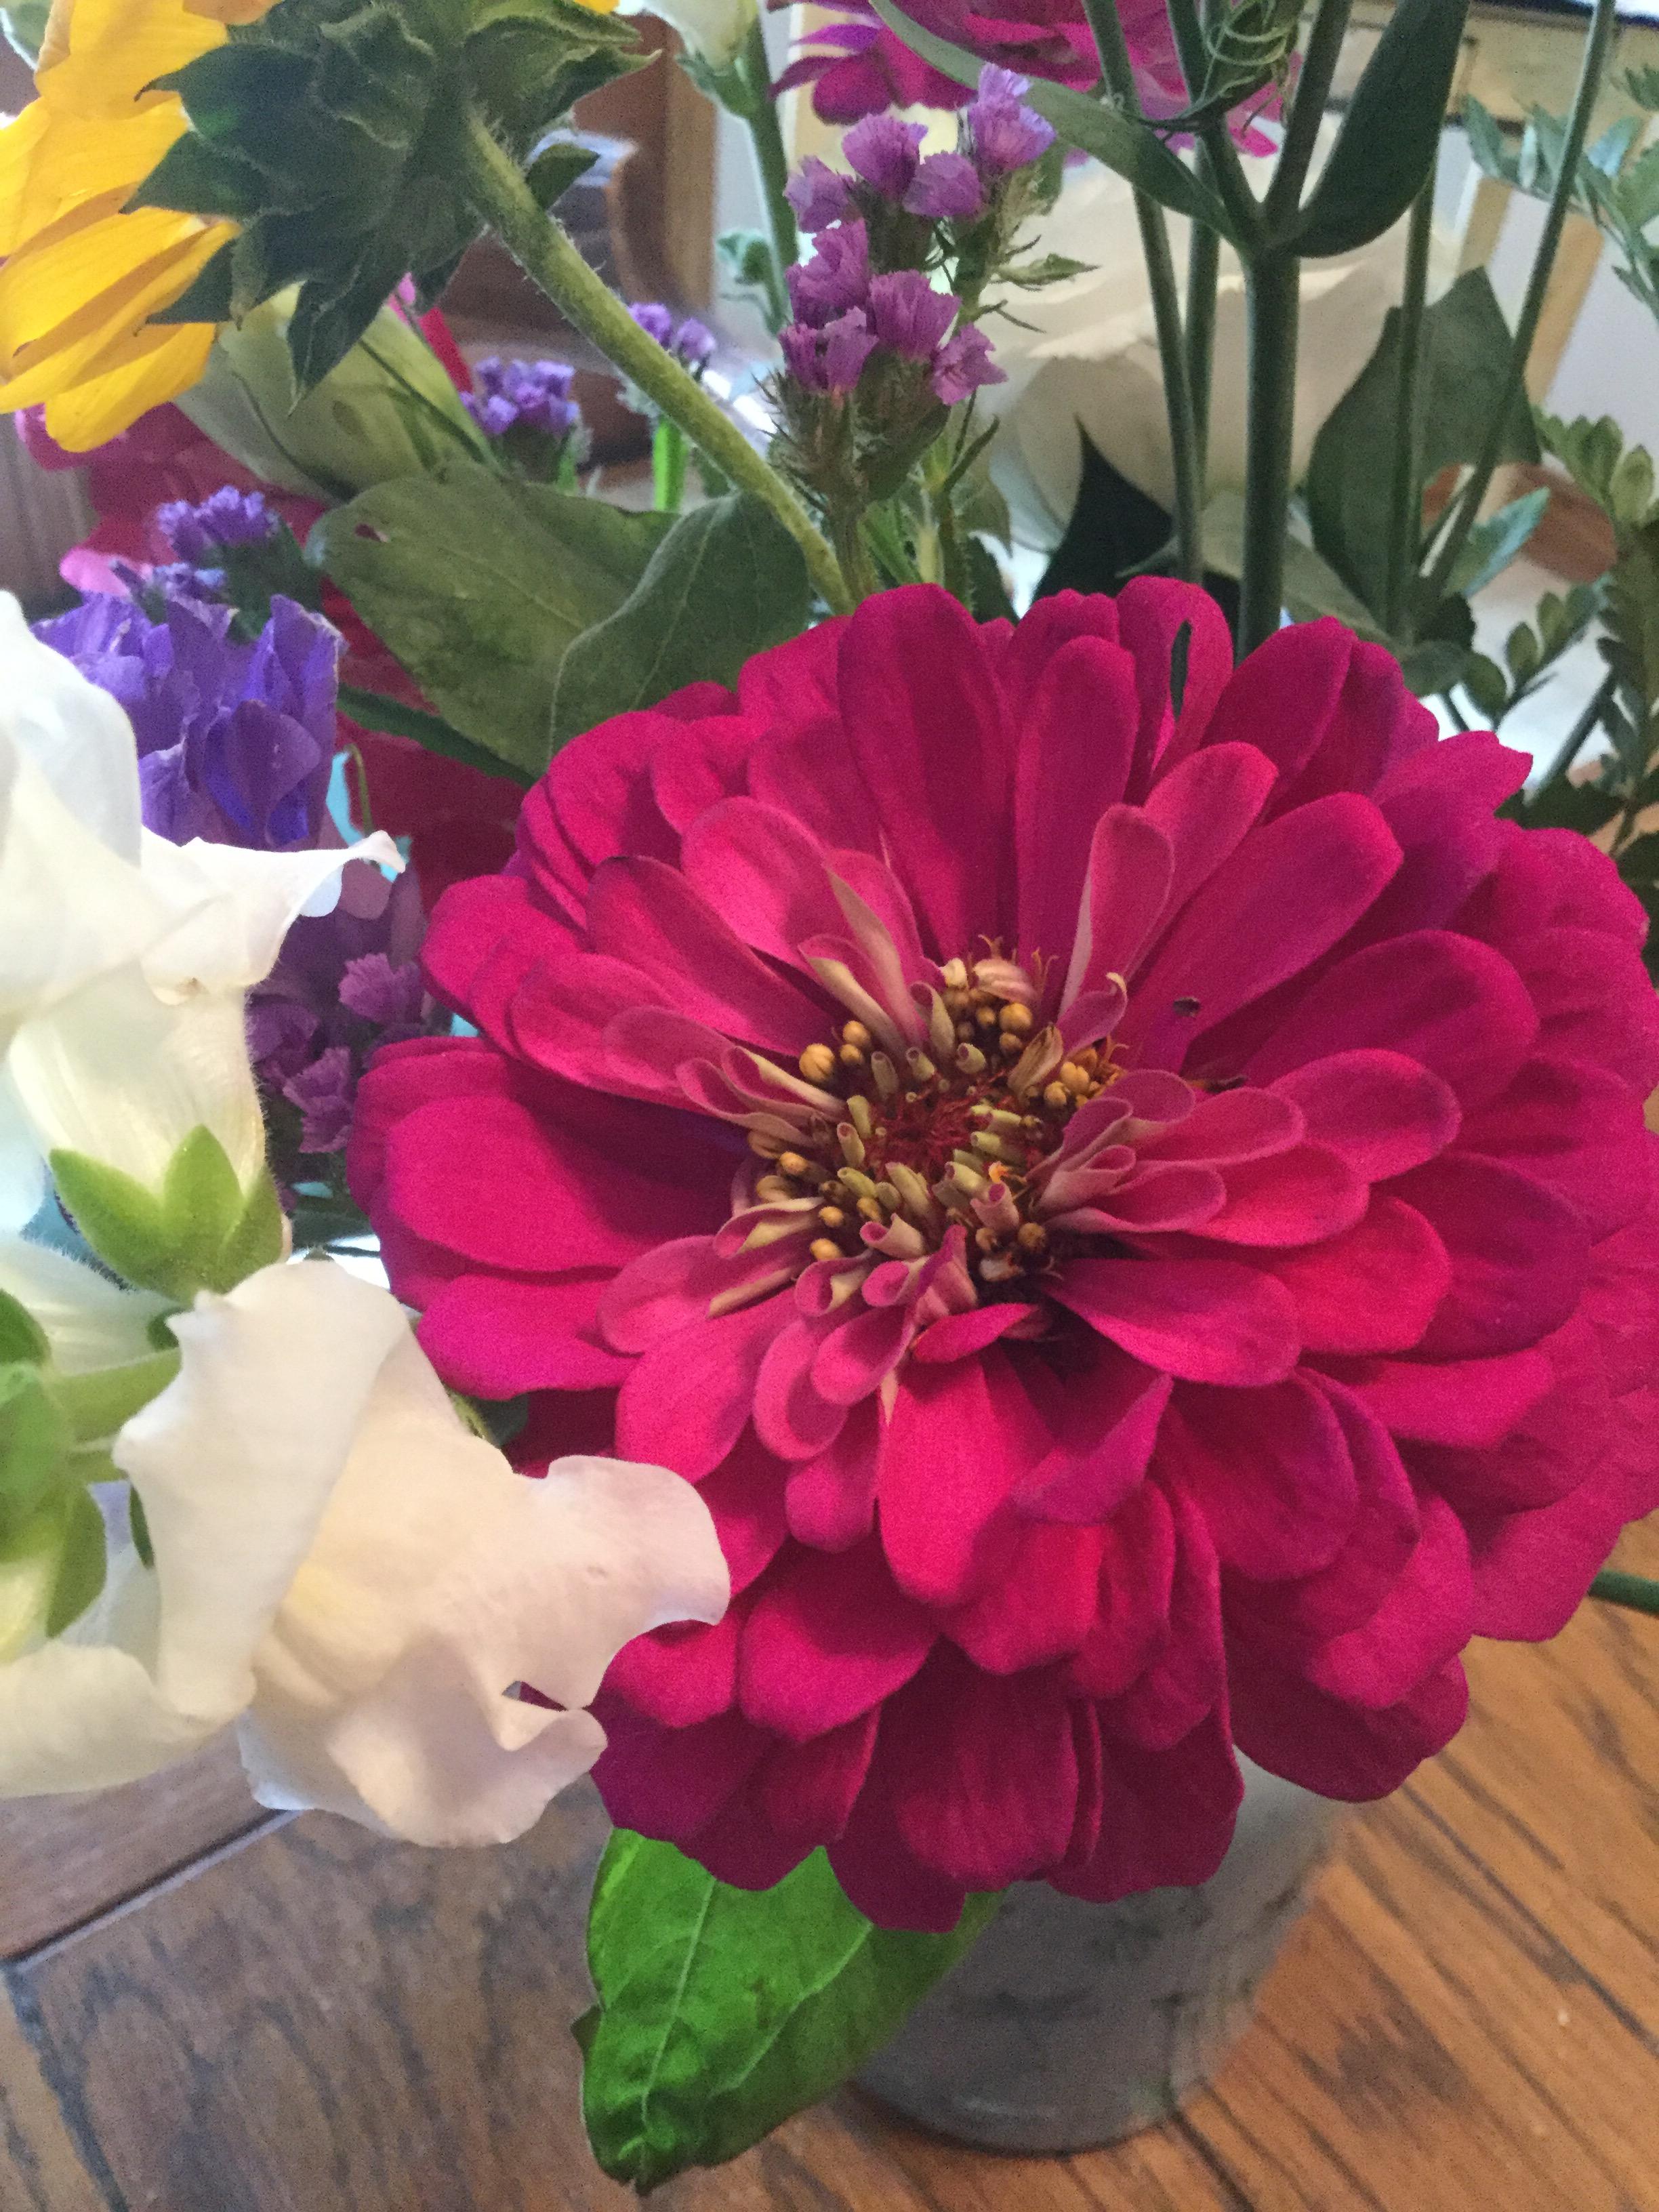 flowerrr1